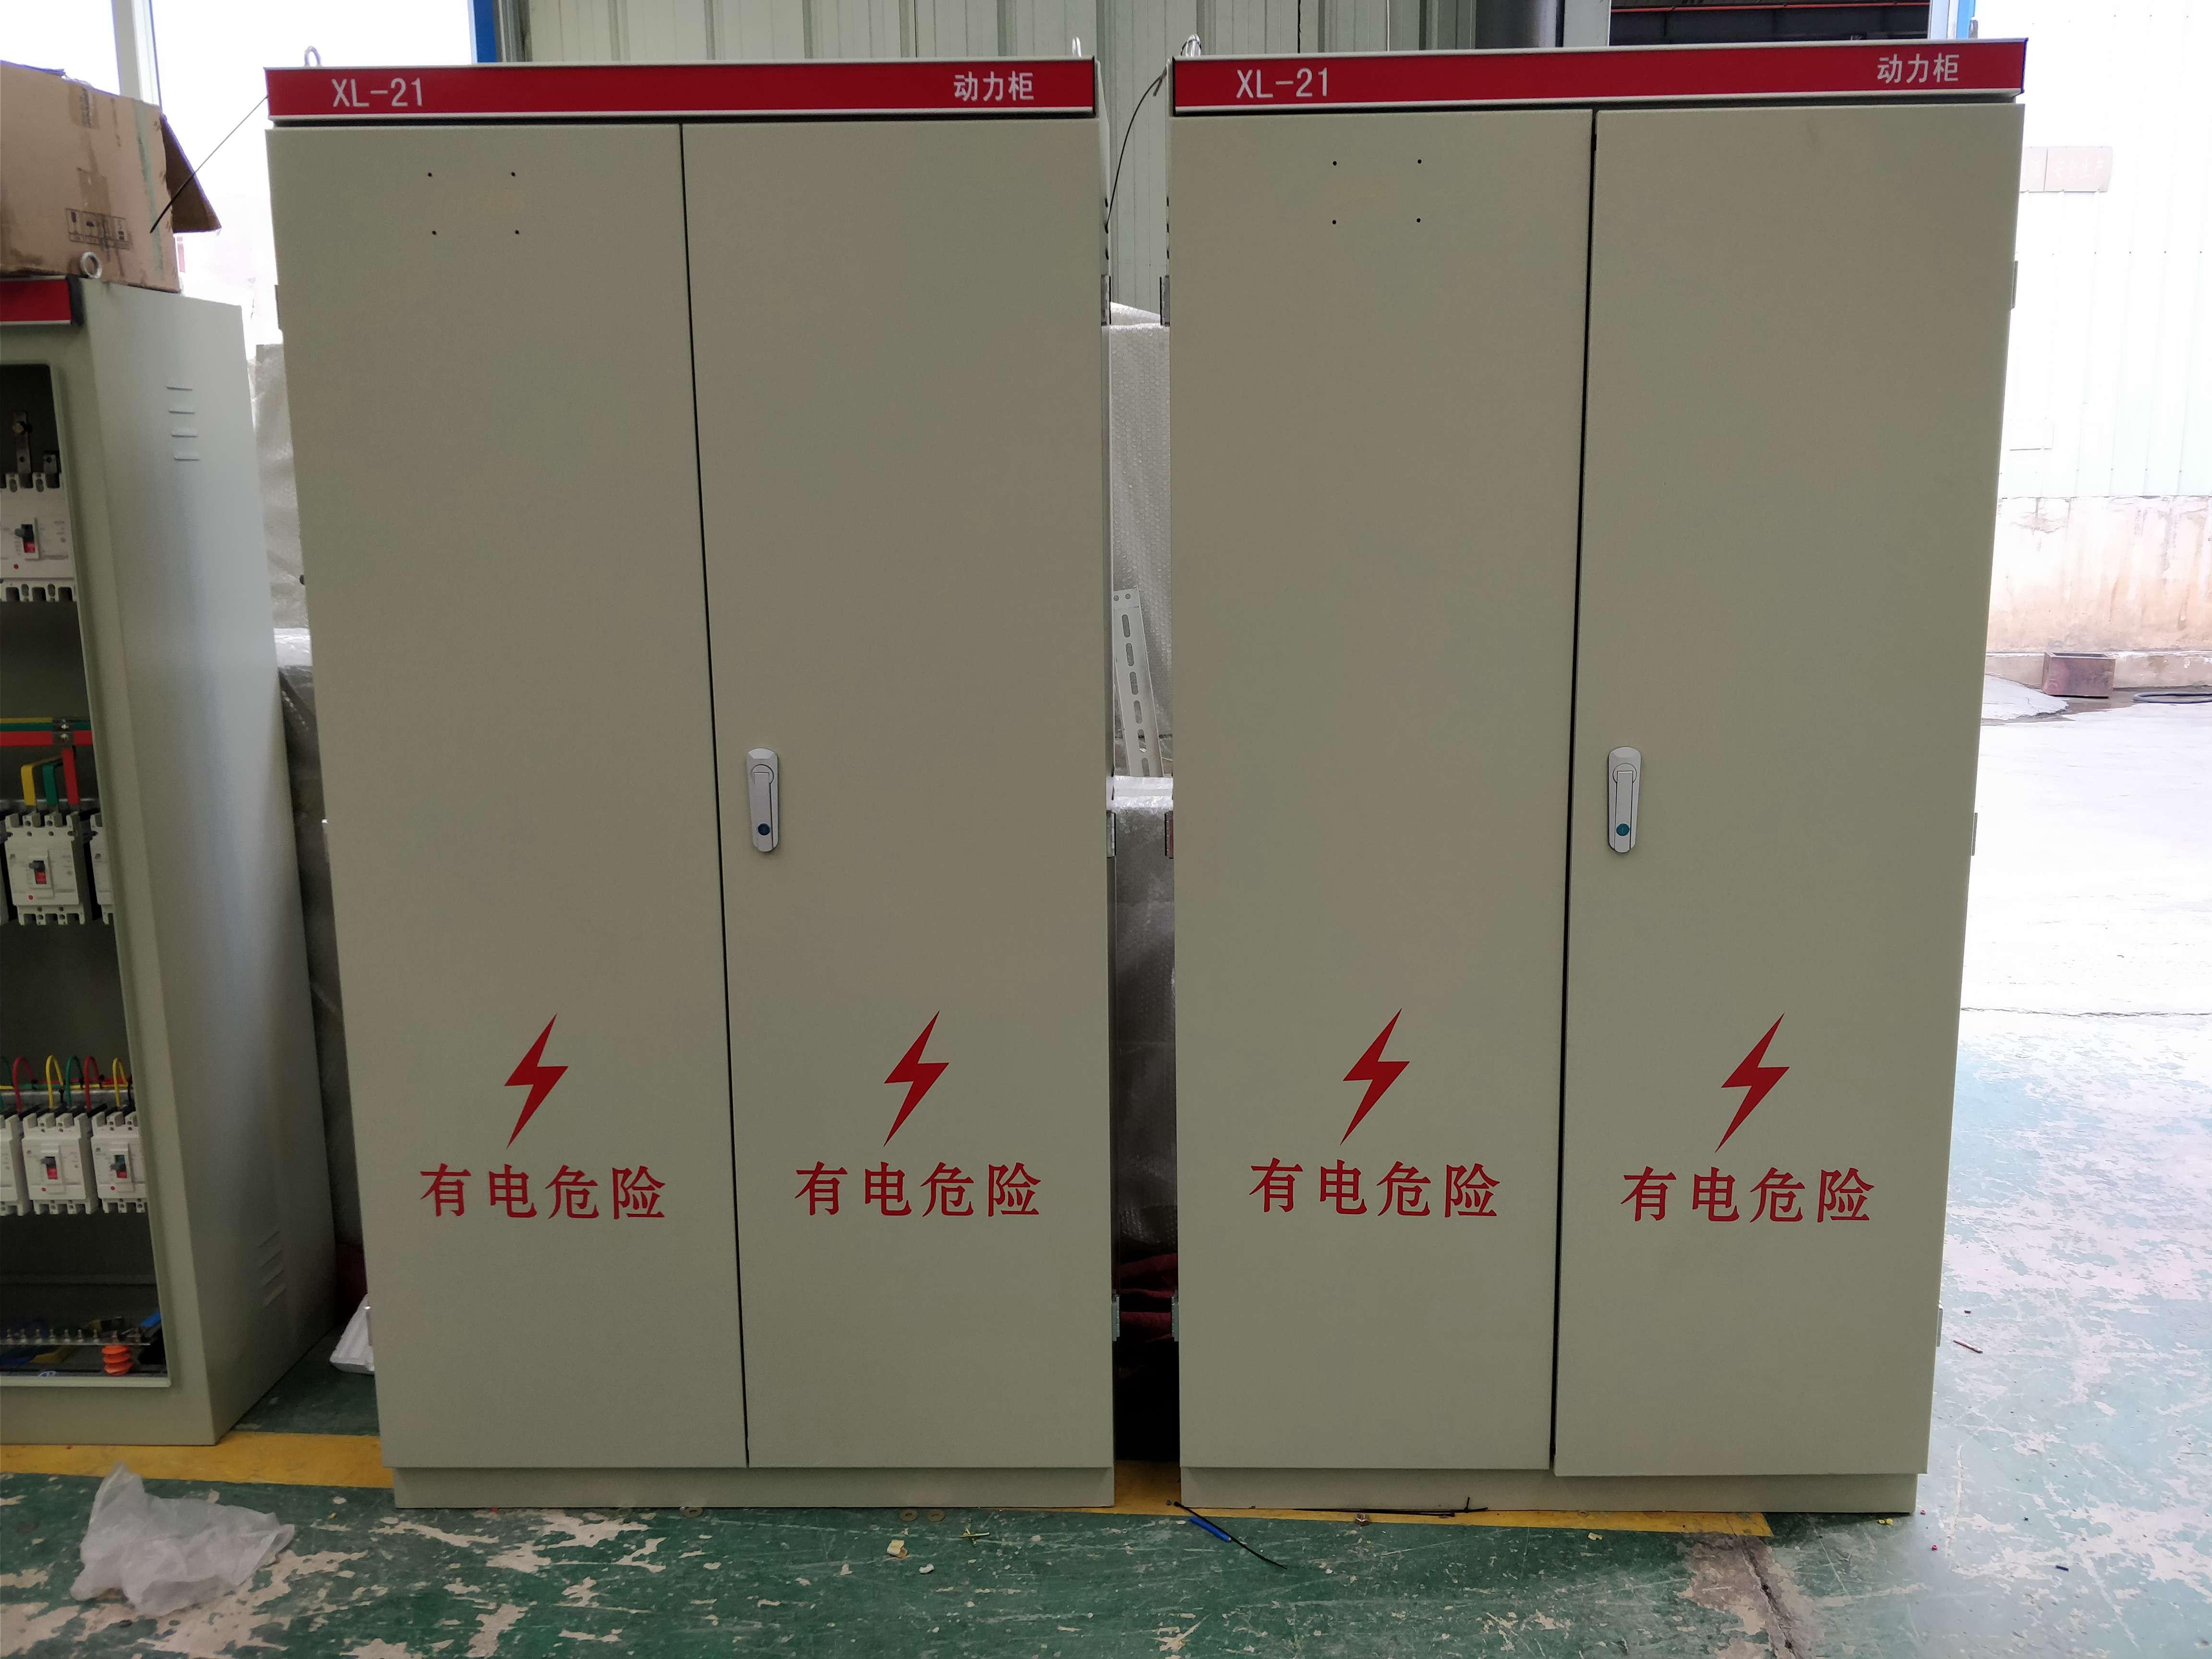 xl 动力配电柜